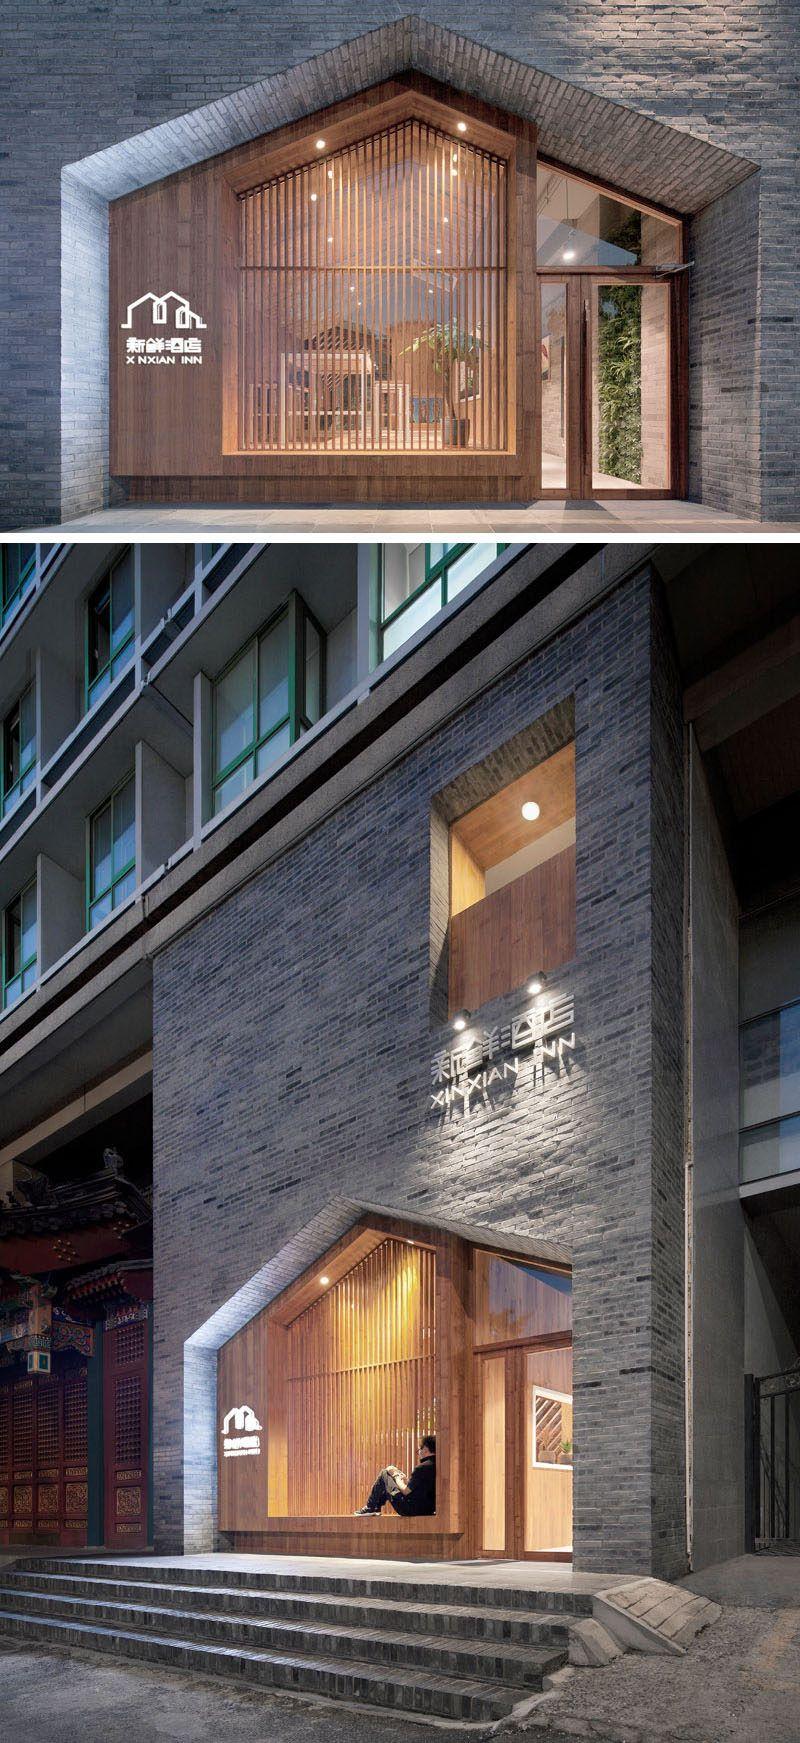 Gray Bricks And Wood Work Create